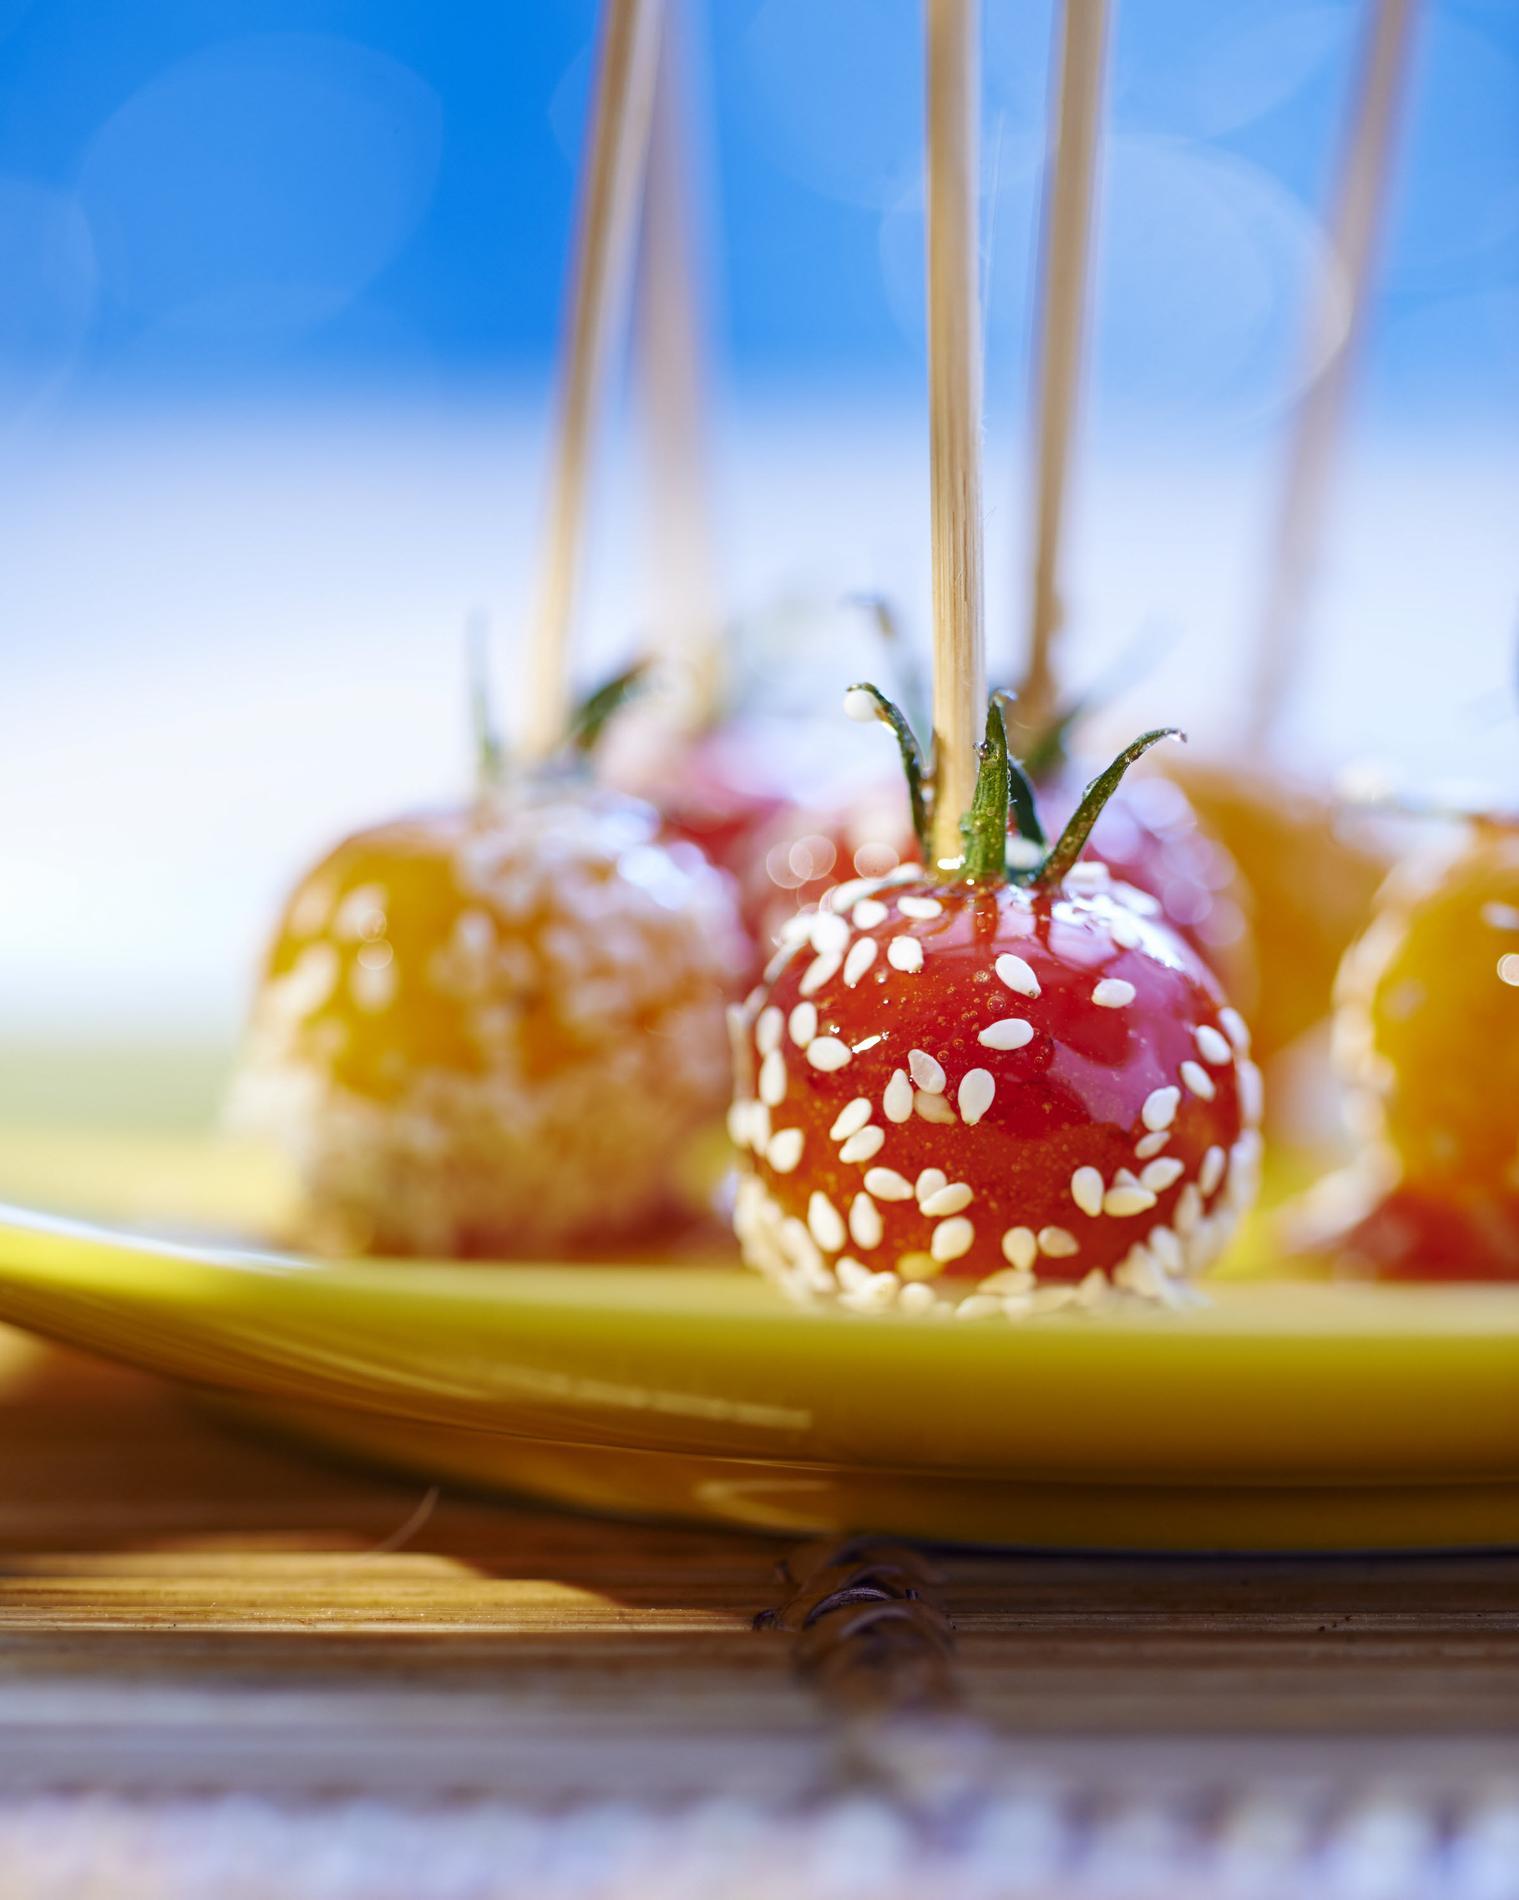 recette tomates cerises au s same fa on pommes d 39 amour cuisine madame figaro. Black Bedroom Furniture Sets. Home Design Ideas